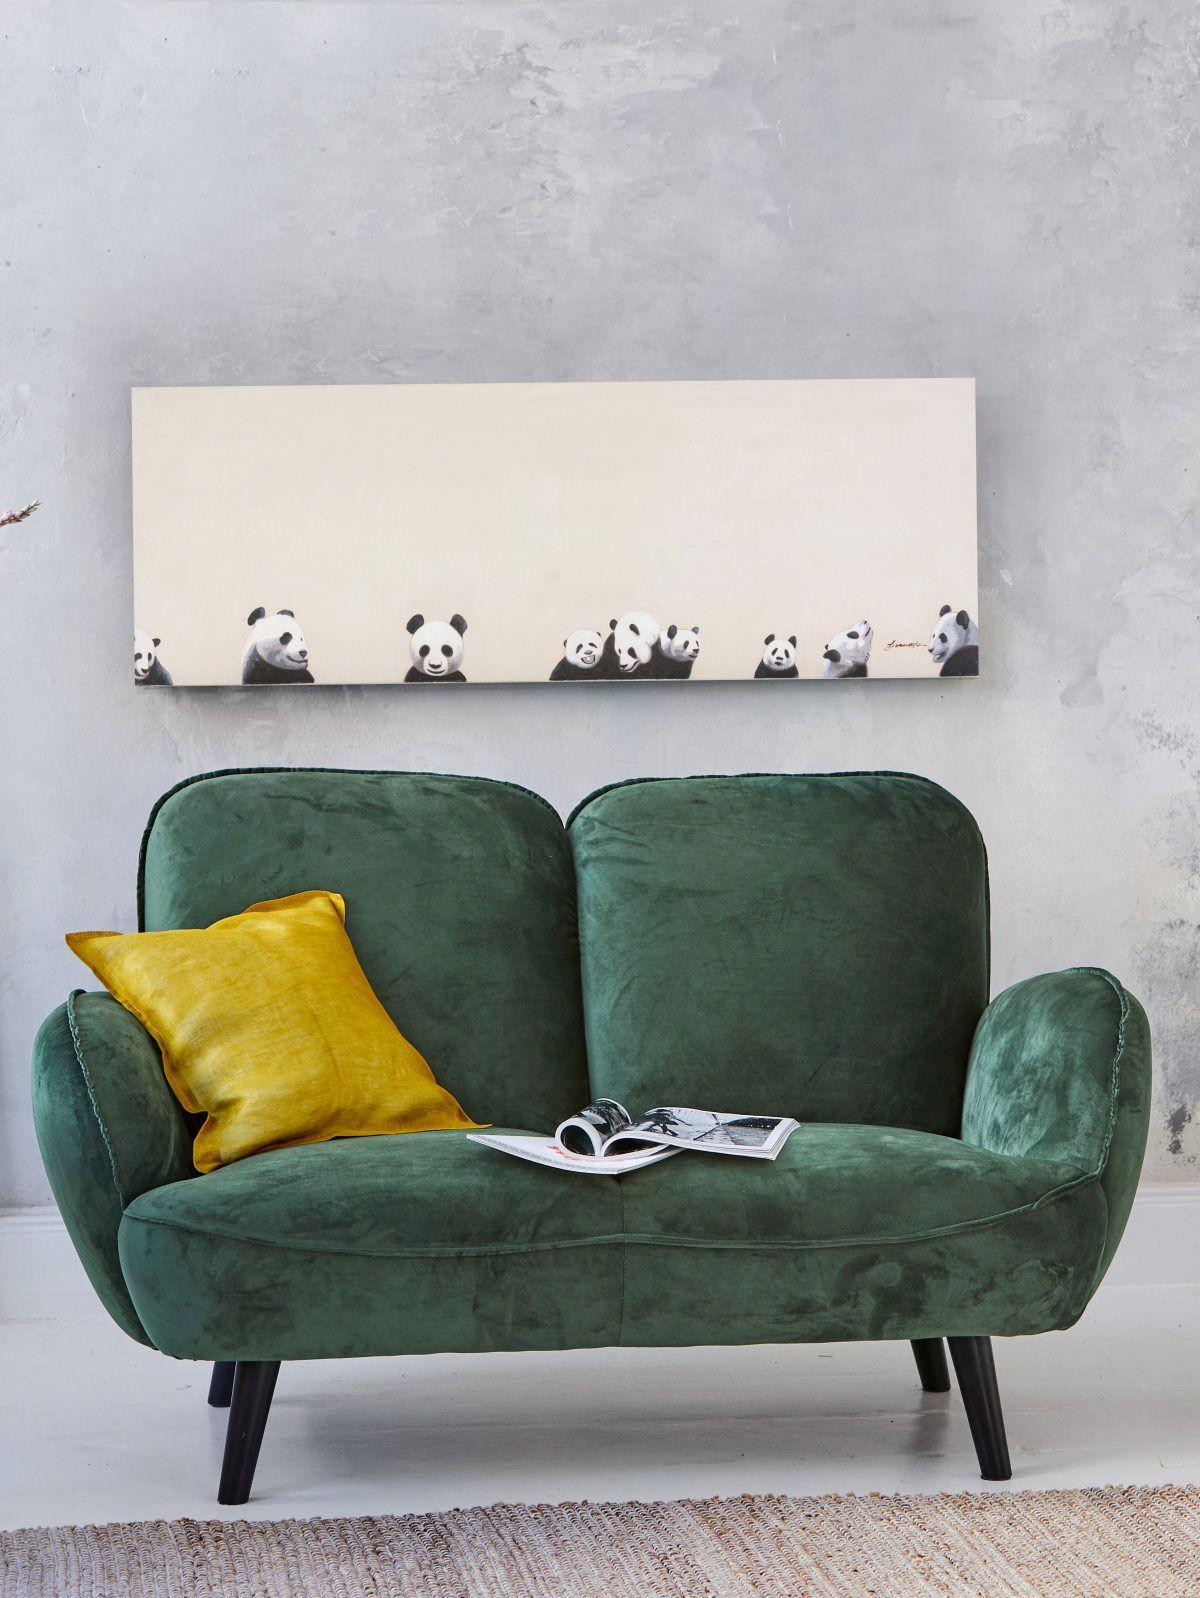 2 Sitzer Sofa Grün